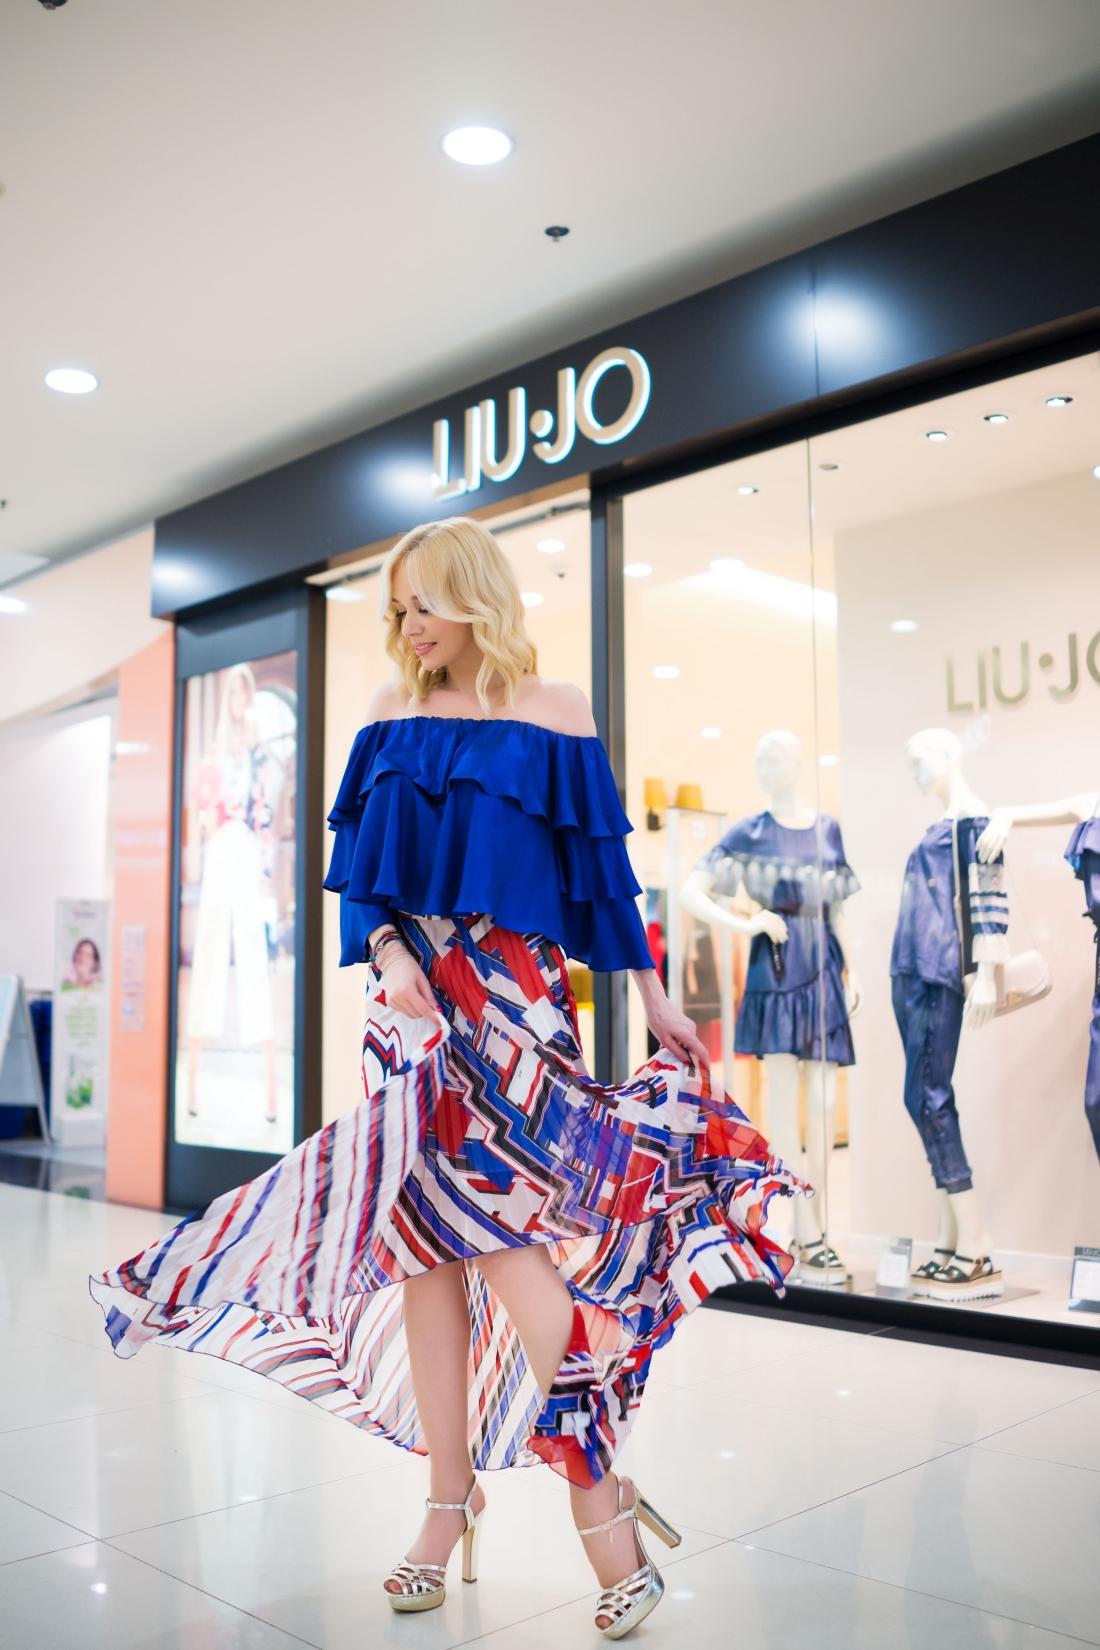 19_Liu Jo_FashionFriends_Jelena Rozga_SS2018_6